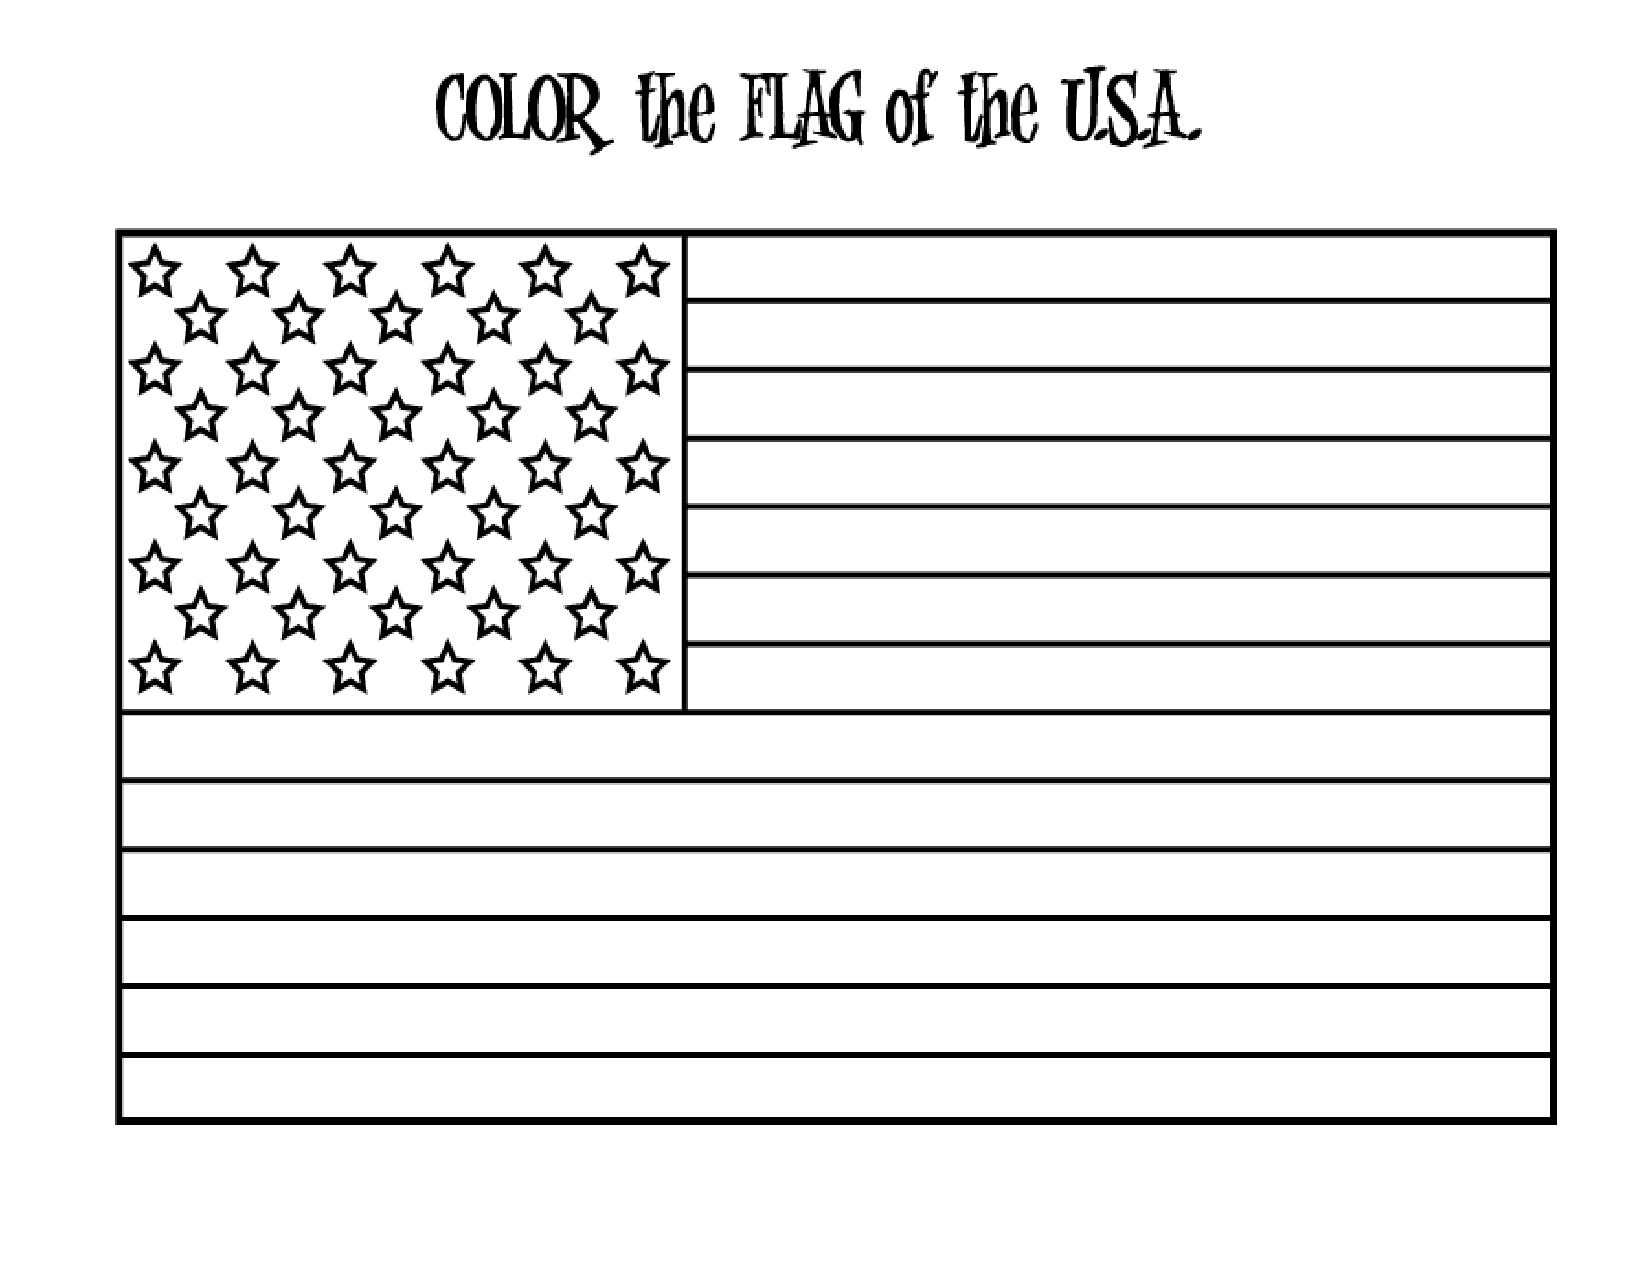 Free American Flag Printable, Download Free Clip Art, Free Clip Art - Free Printable American Flag Coloring Page